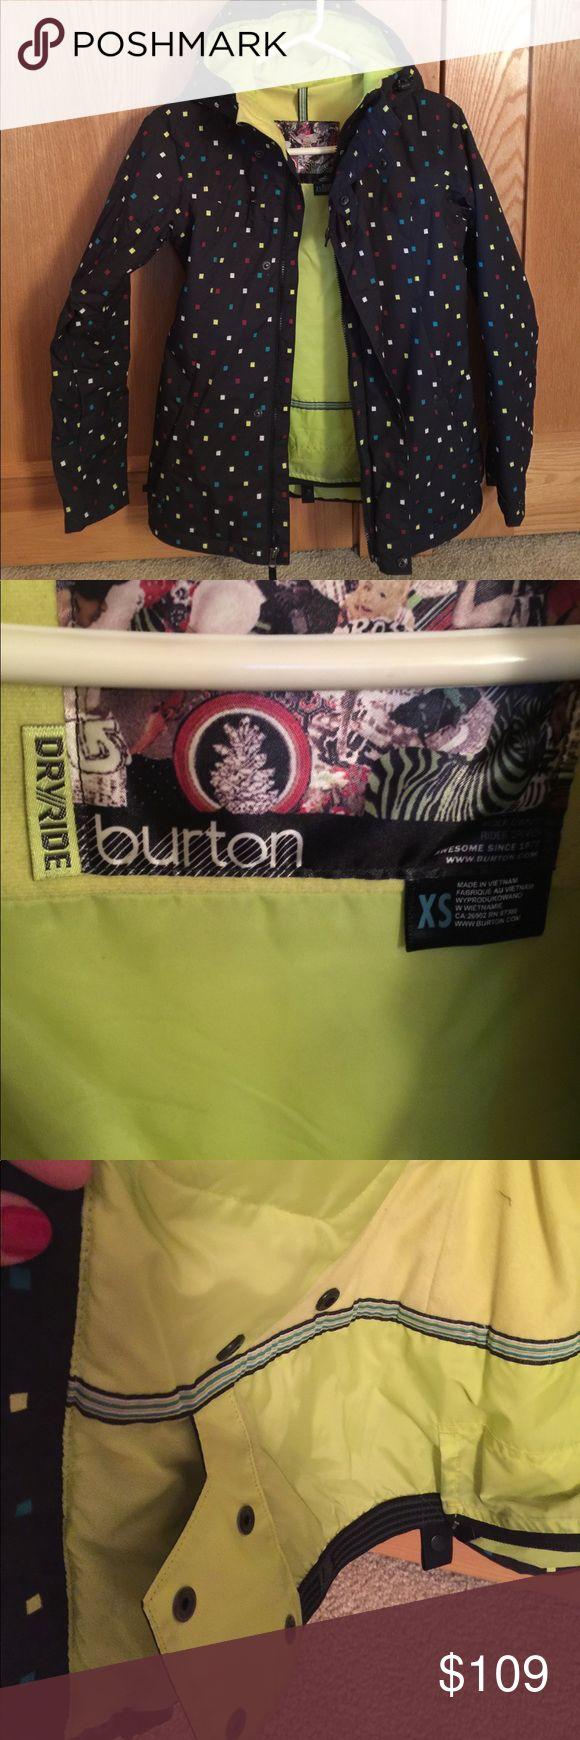 Burton ski or snowboard coat Burton ski or snowboard coat.  So many great features: zipper arm vents, waist powder guard, ski pass ticket clip in pocket, warm yet lets you breath. XS Burton Jackets & Coats